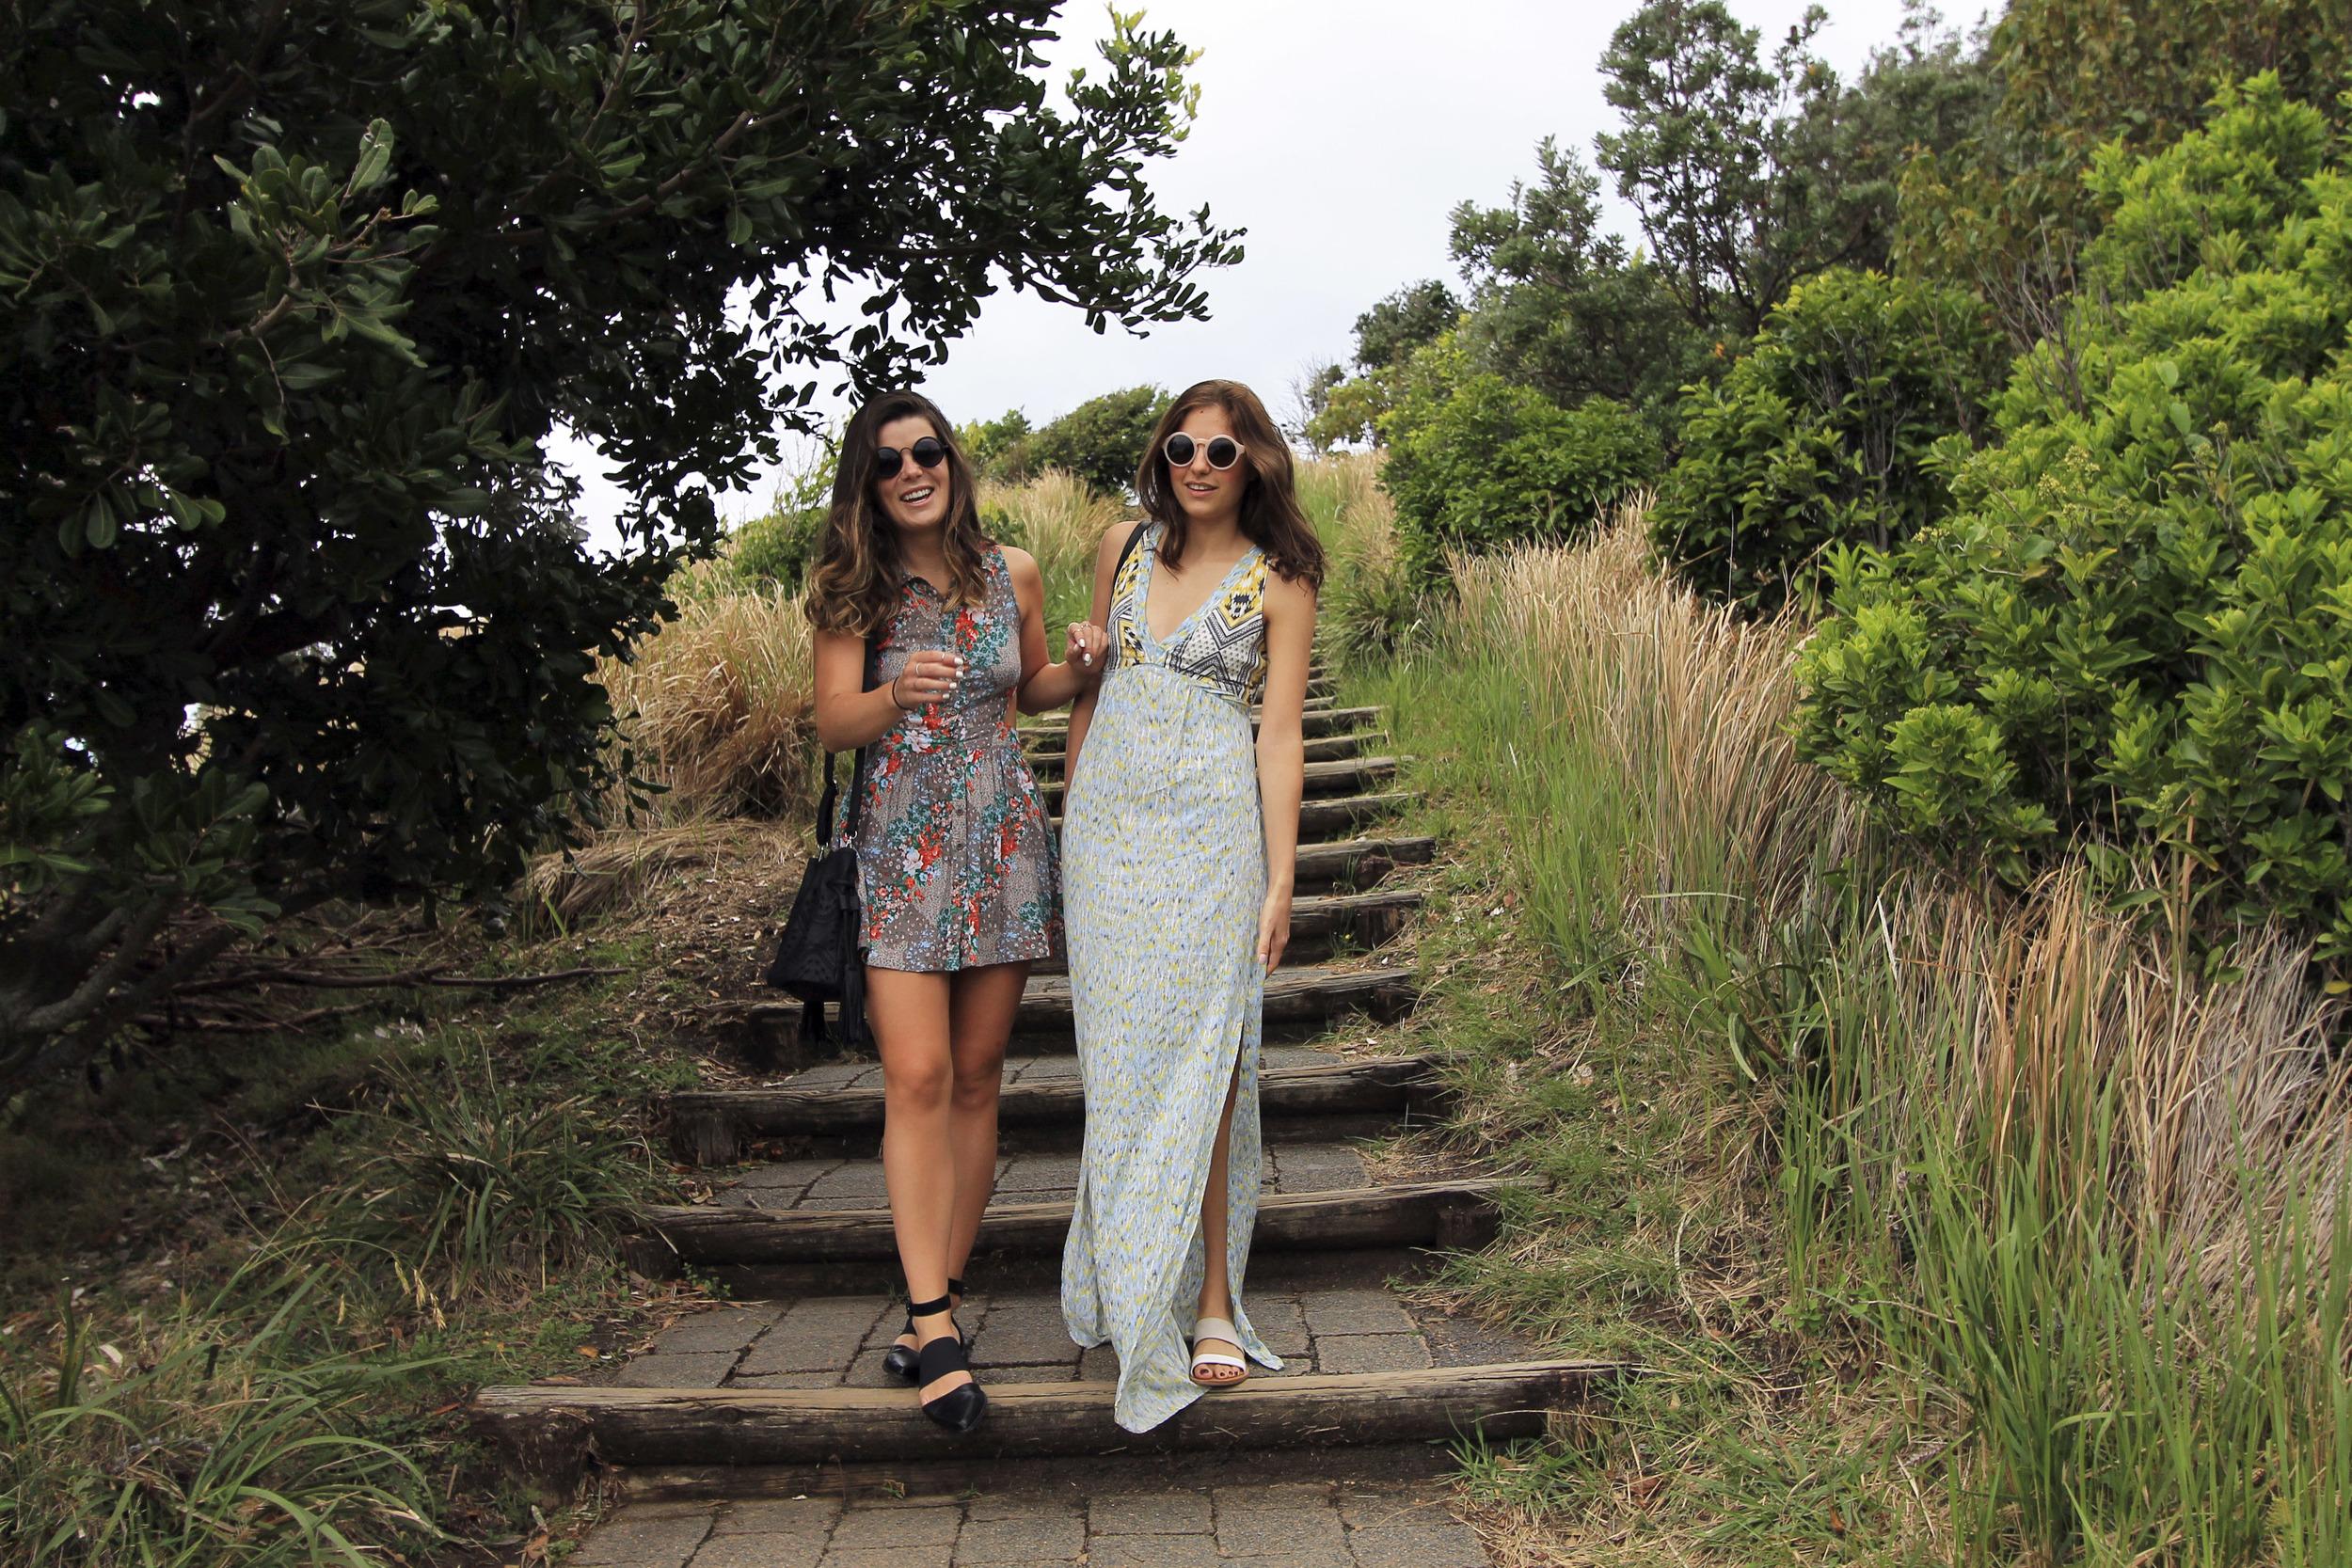 fashion-blogger-canada-australia-style-minkpink.jpg